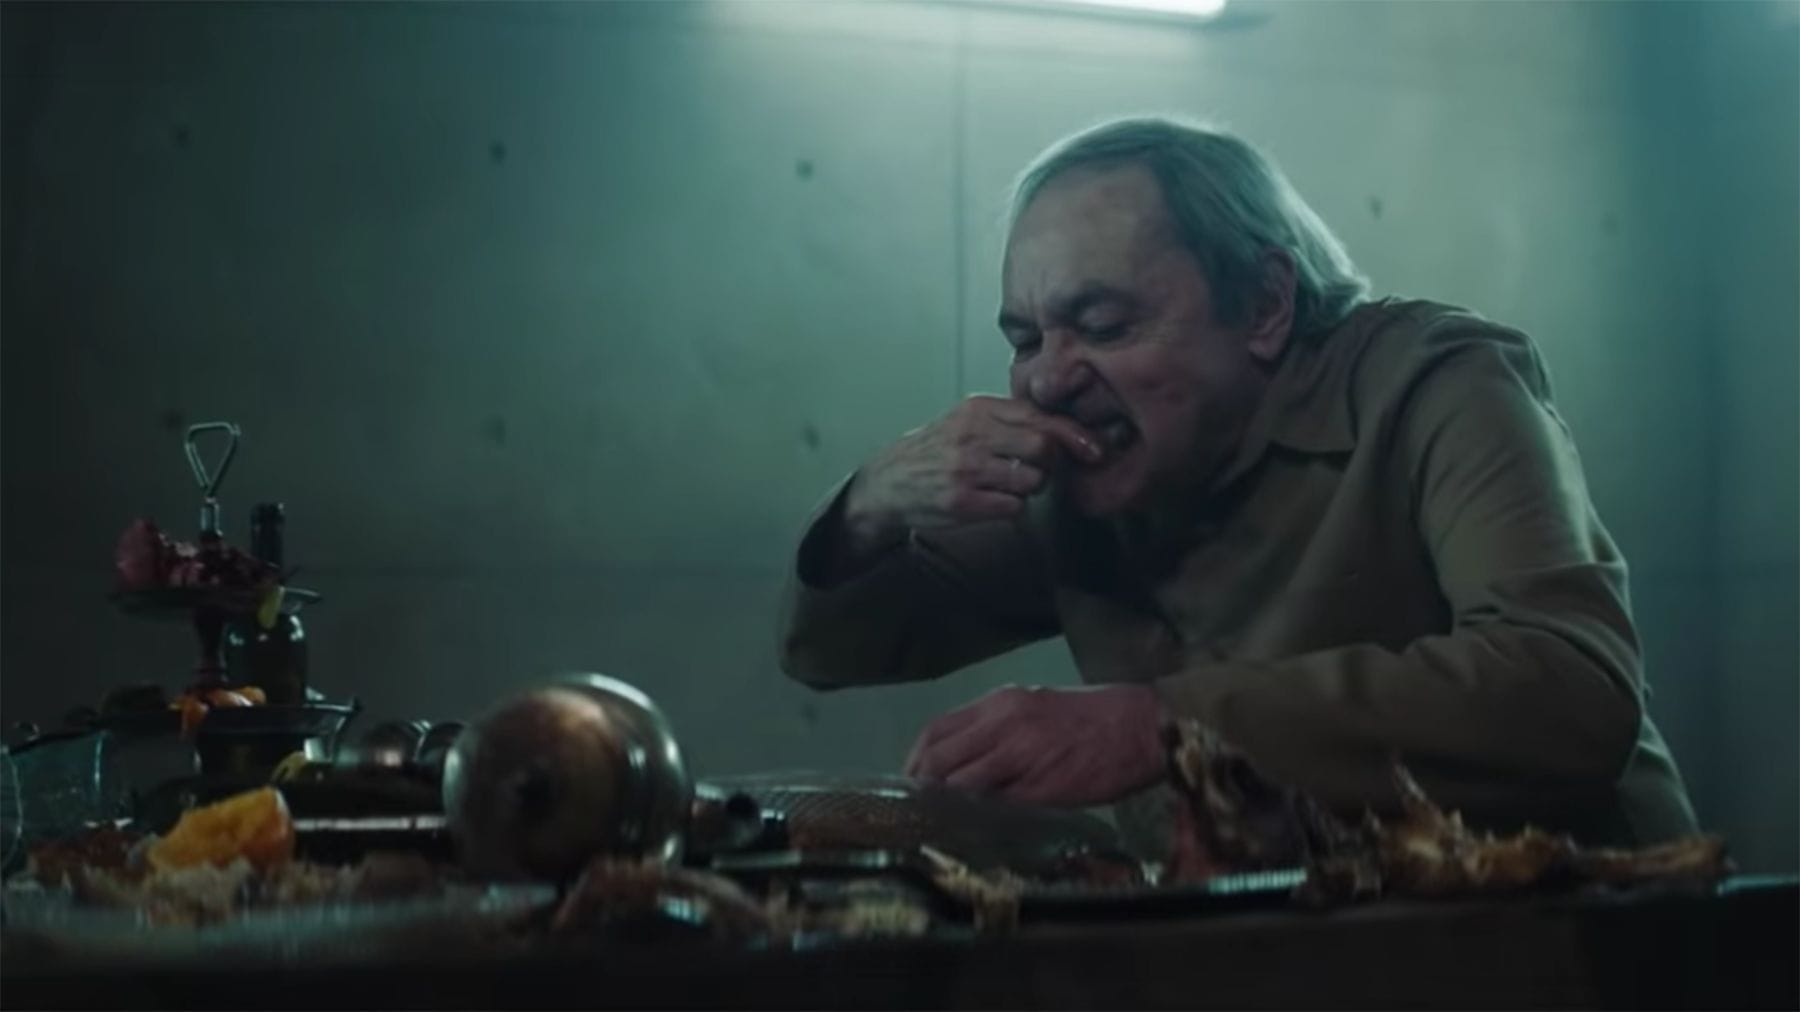 Trailer: The Platform | Kino/TV | Was is hier eigentlich los?